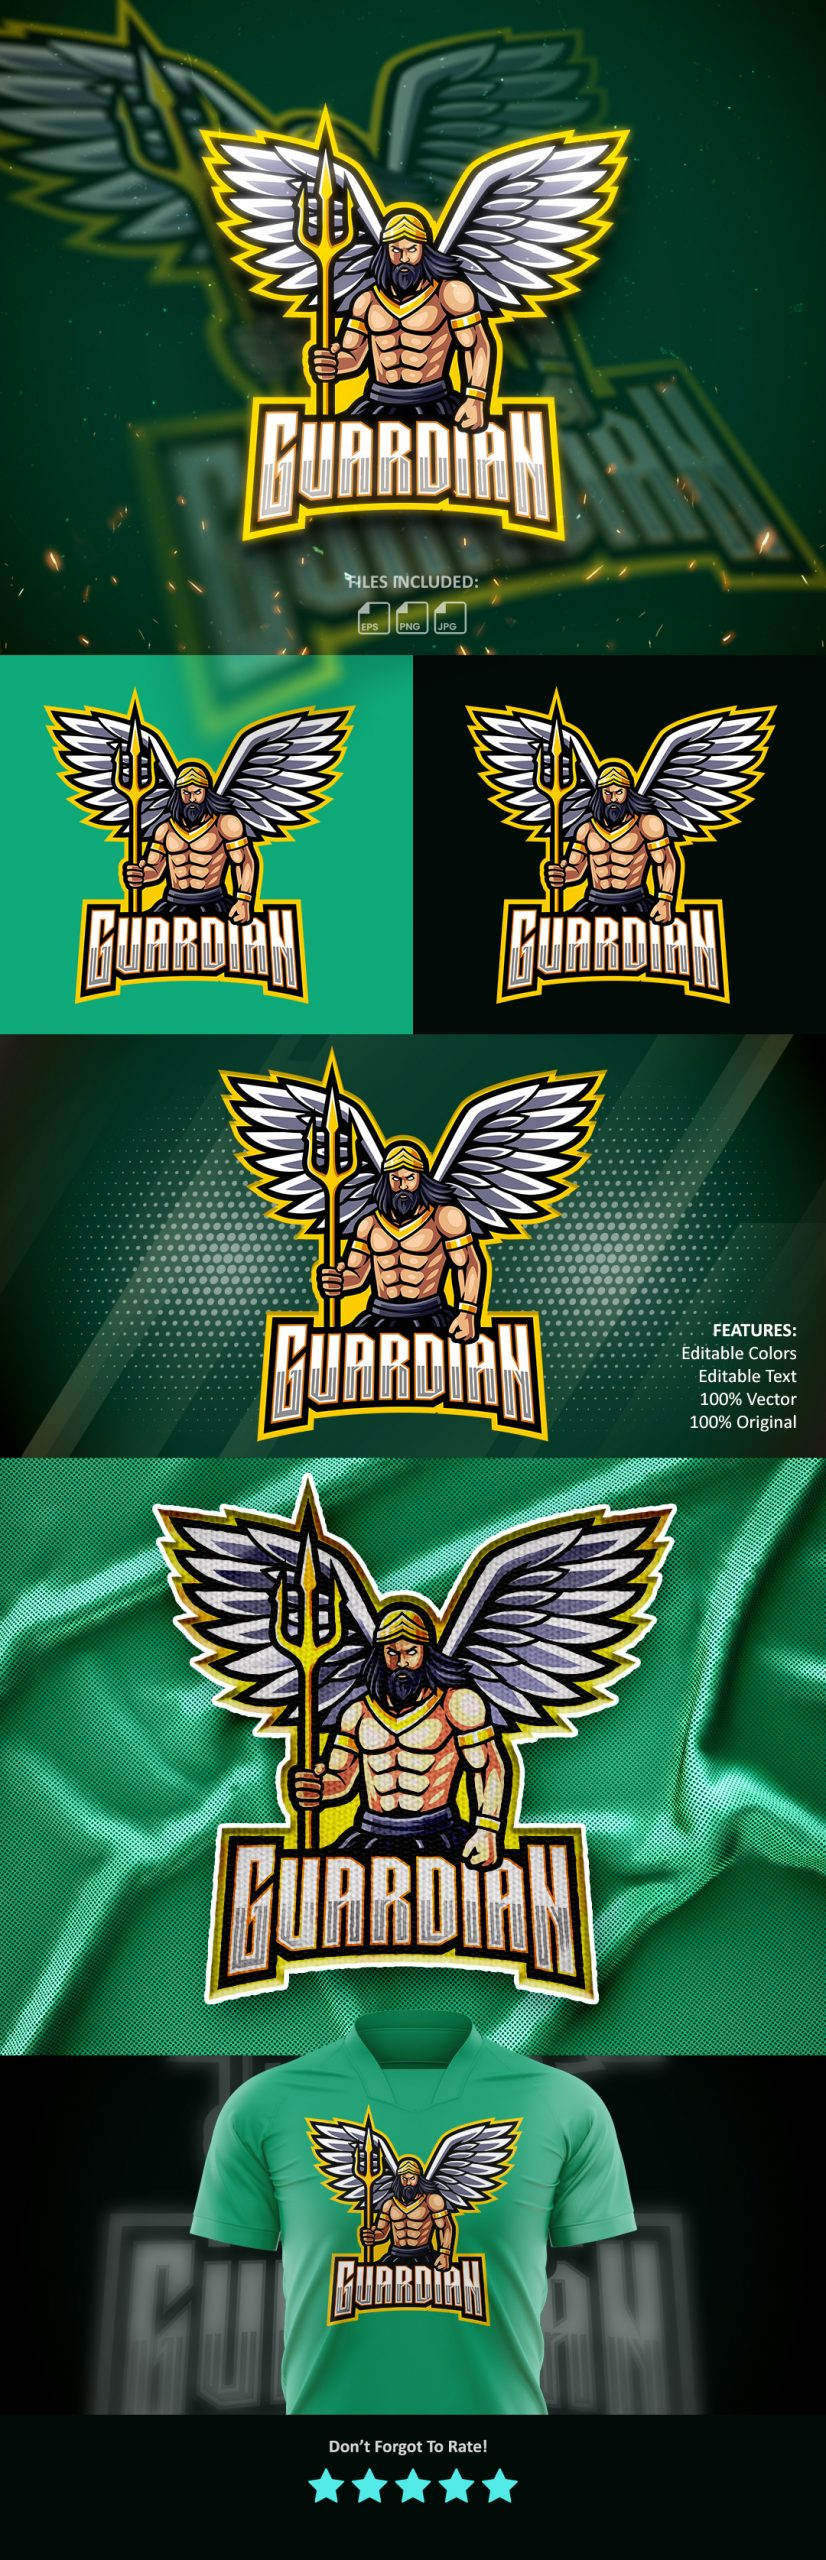 Guardians-Esports-Gaming-Clan-Mascot-Logo-Free-Download-